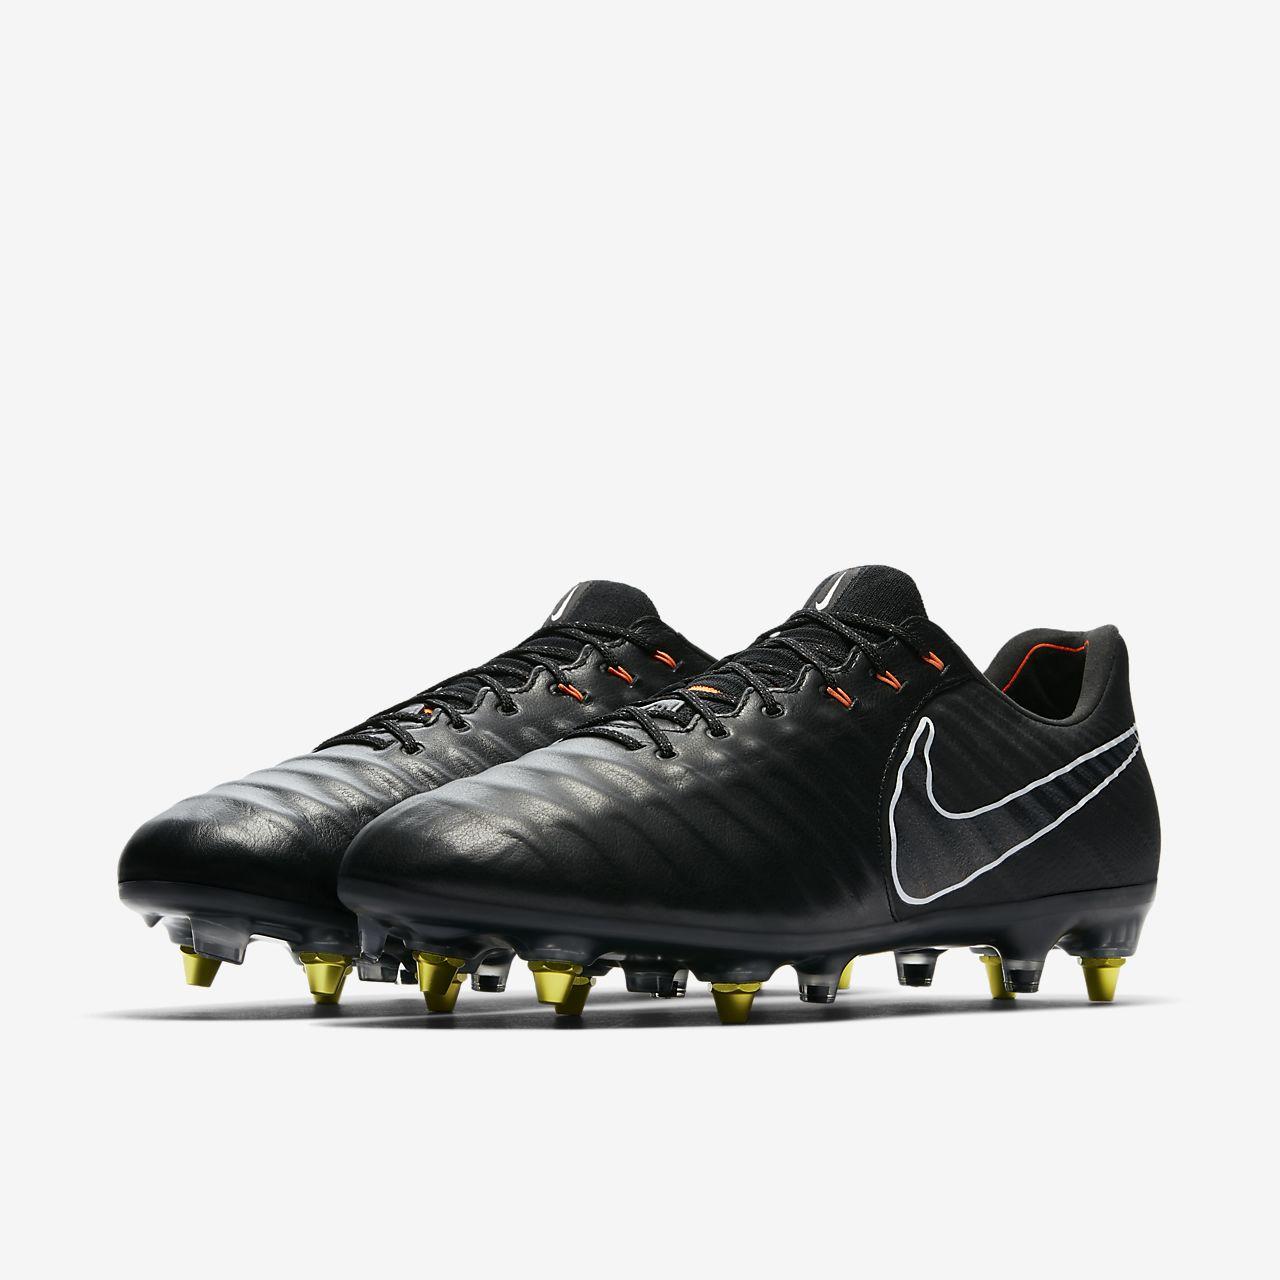 d1ab040a6 ... pro mens football boots 21ec6 86bb7  top quality nike tiempo legend  soft ground 1992a a8c08